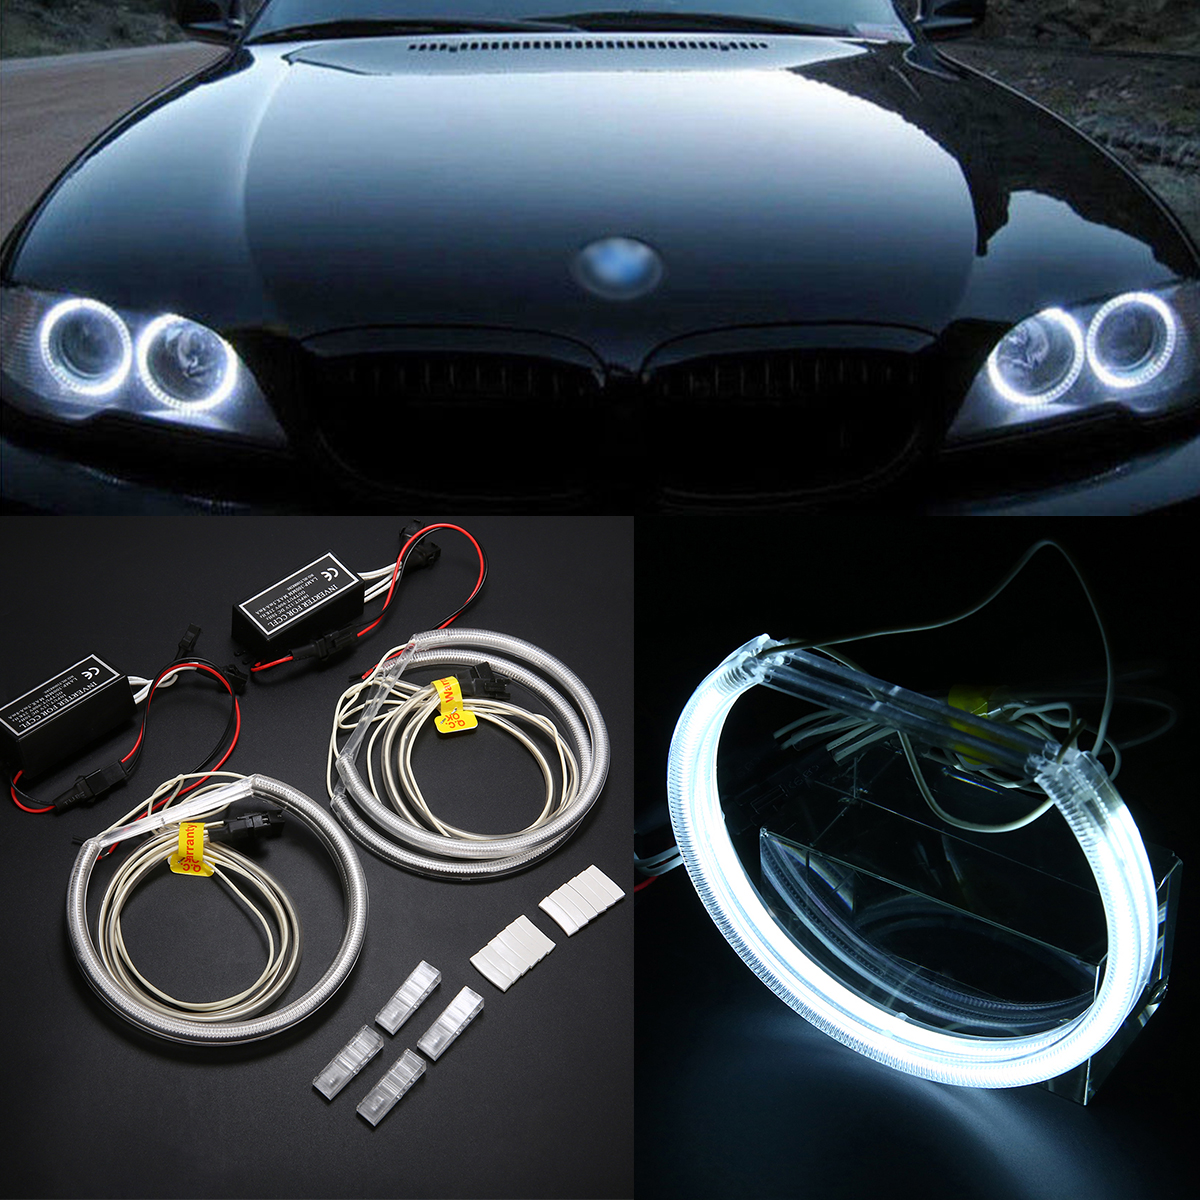 Mayitr 1pc 4pcs CCFL COB LED Angel Eye Super Bright Halo Ring Lights Lamp Set For BMW E36 E38 E39 E46 Led Headlight Car Styling